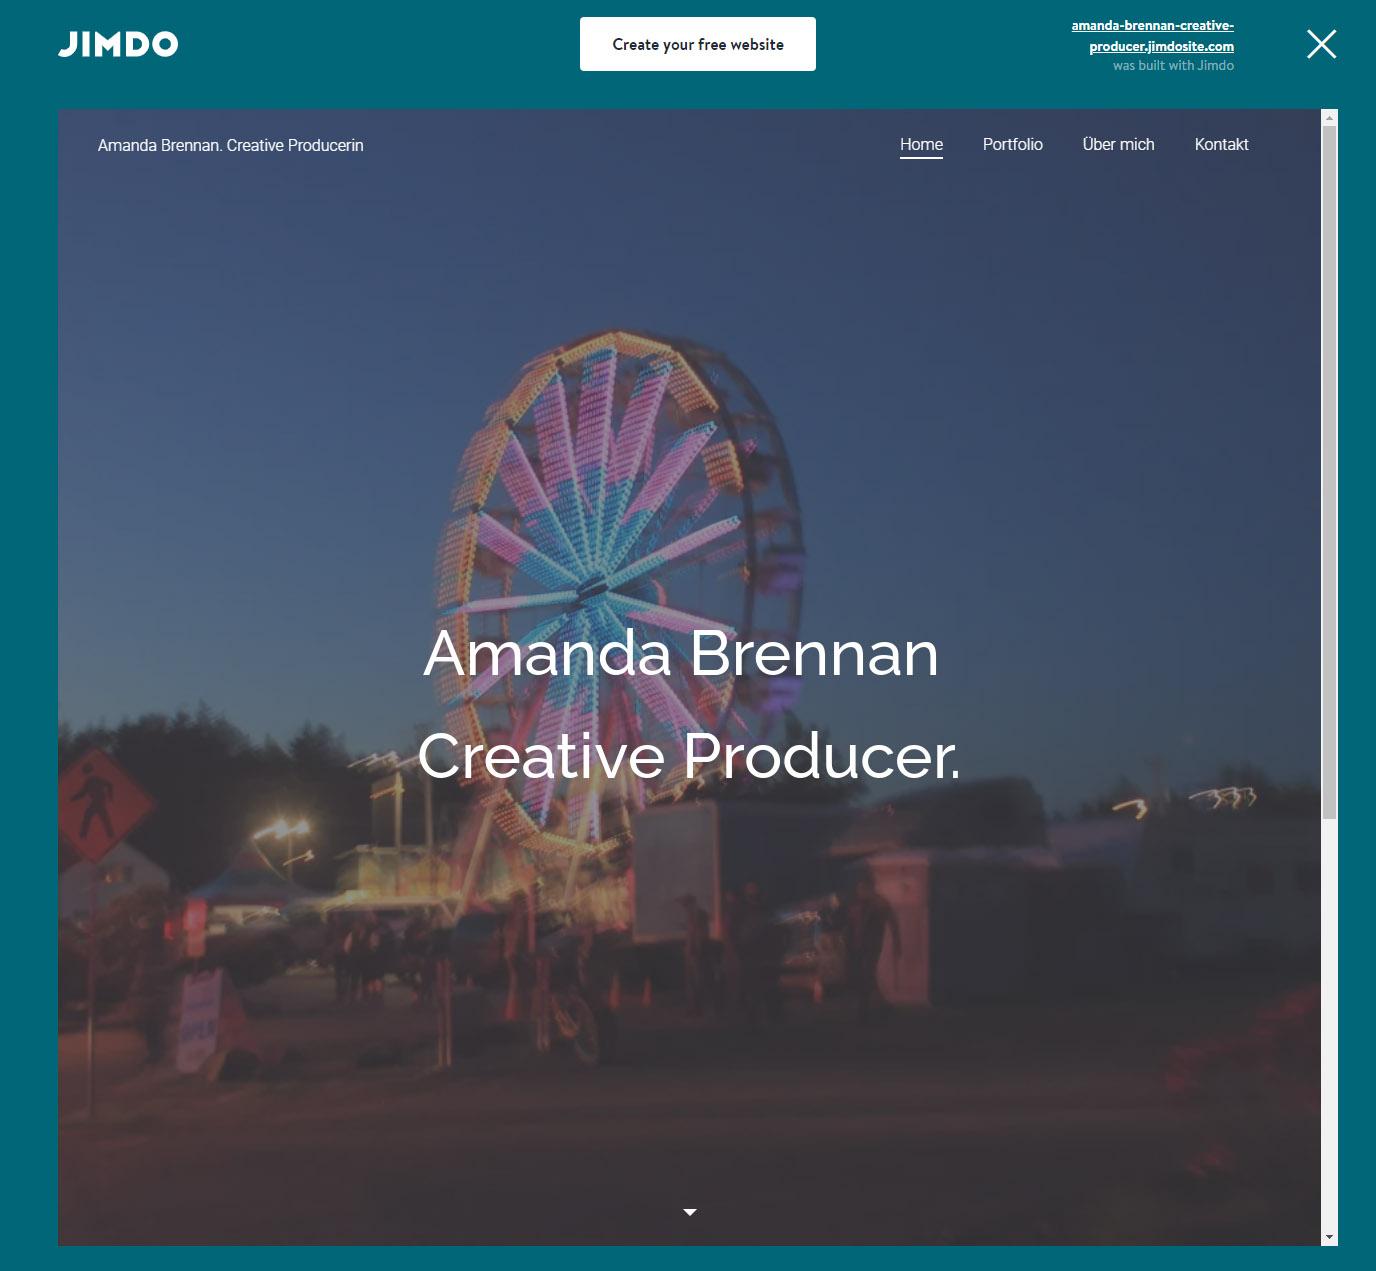 Amanda Brennan homepage